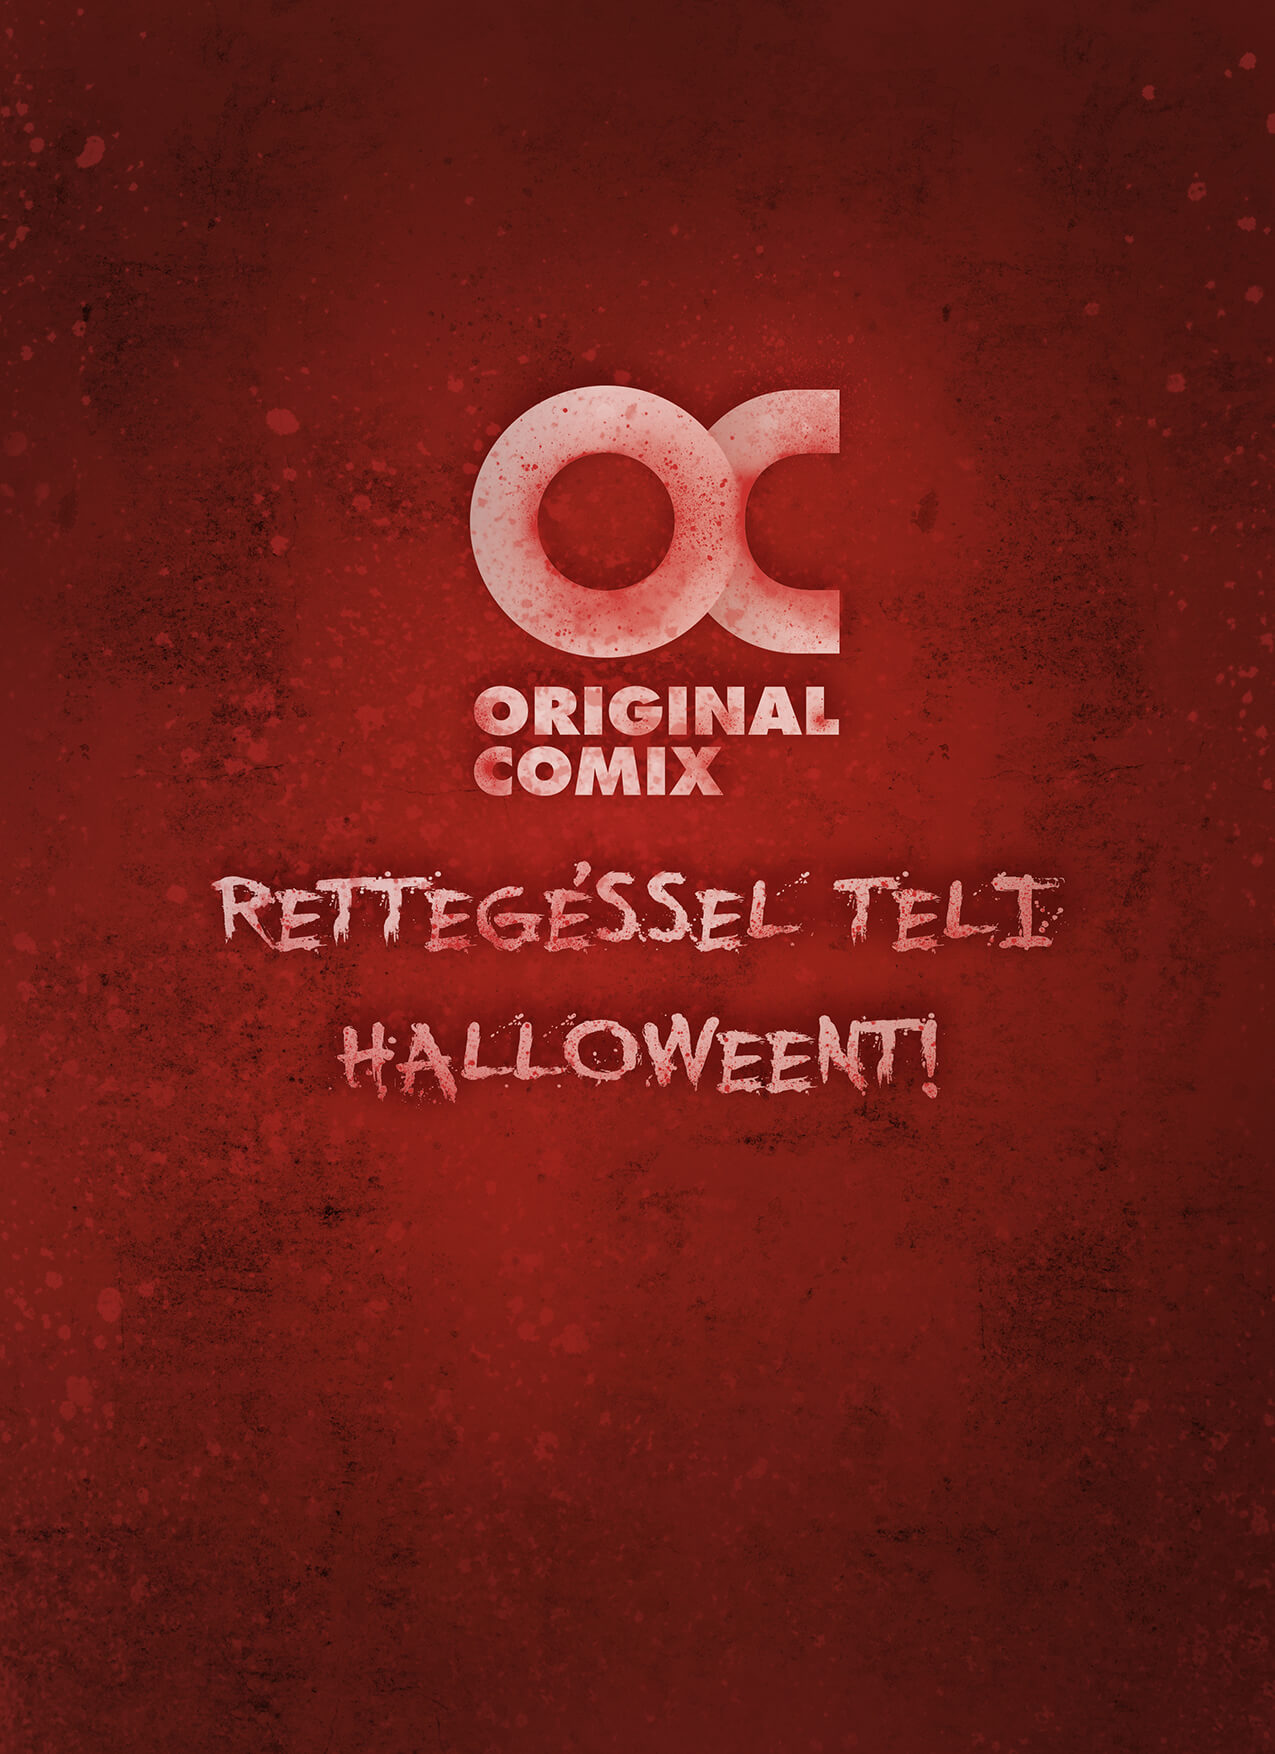 oc_halloween_vacsoravendeg_p06_v2